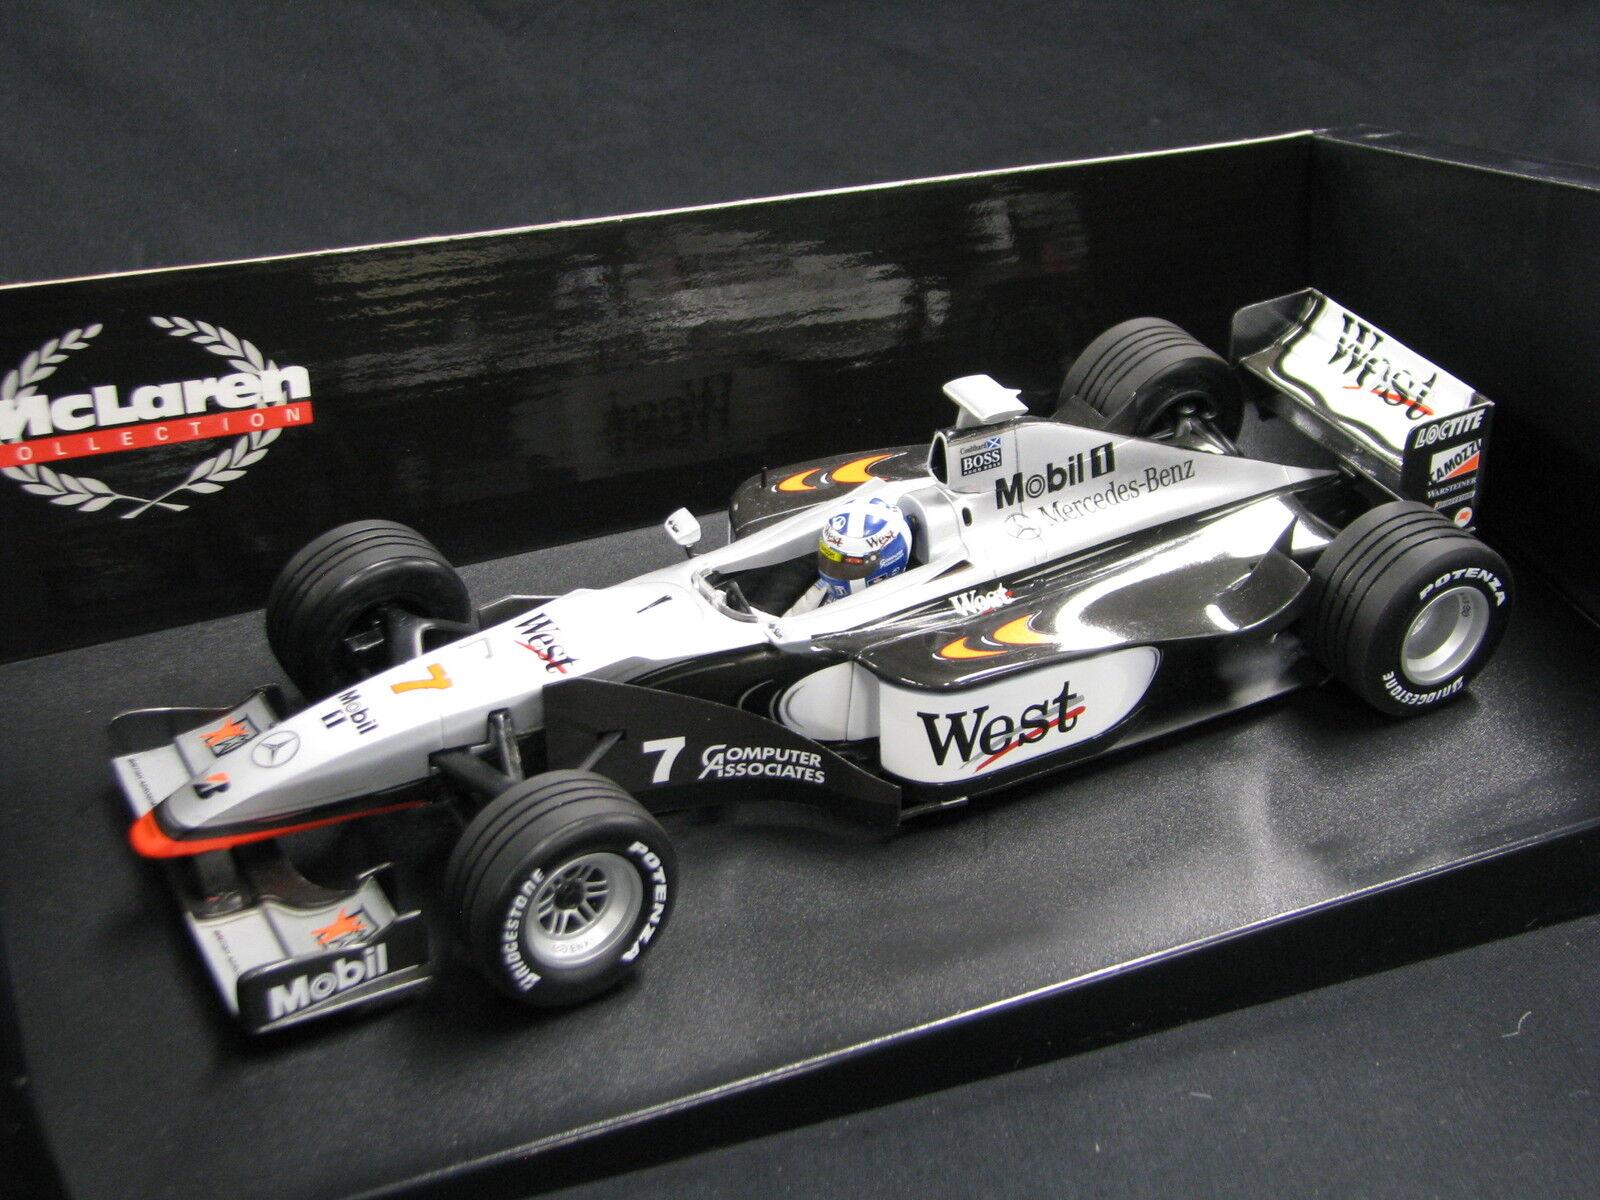 Mercedes mp4   13, campeón del mini oeste de McCochethy 1998  1  18, 3523, David cuta (GBR) (JS)